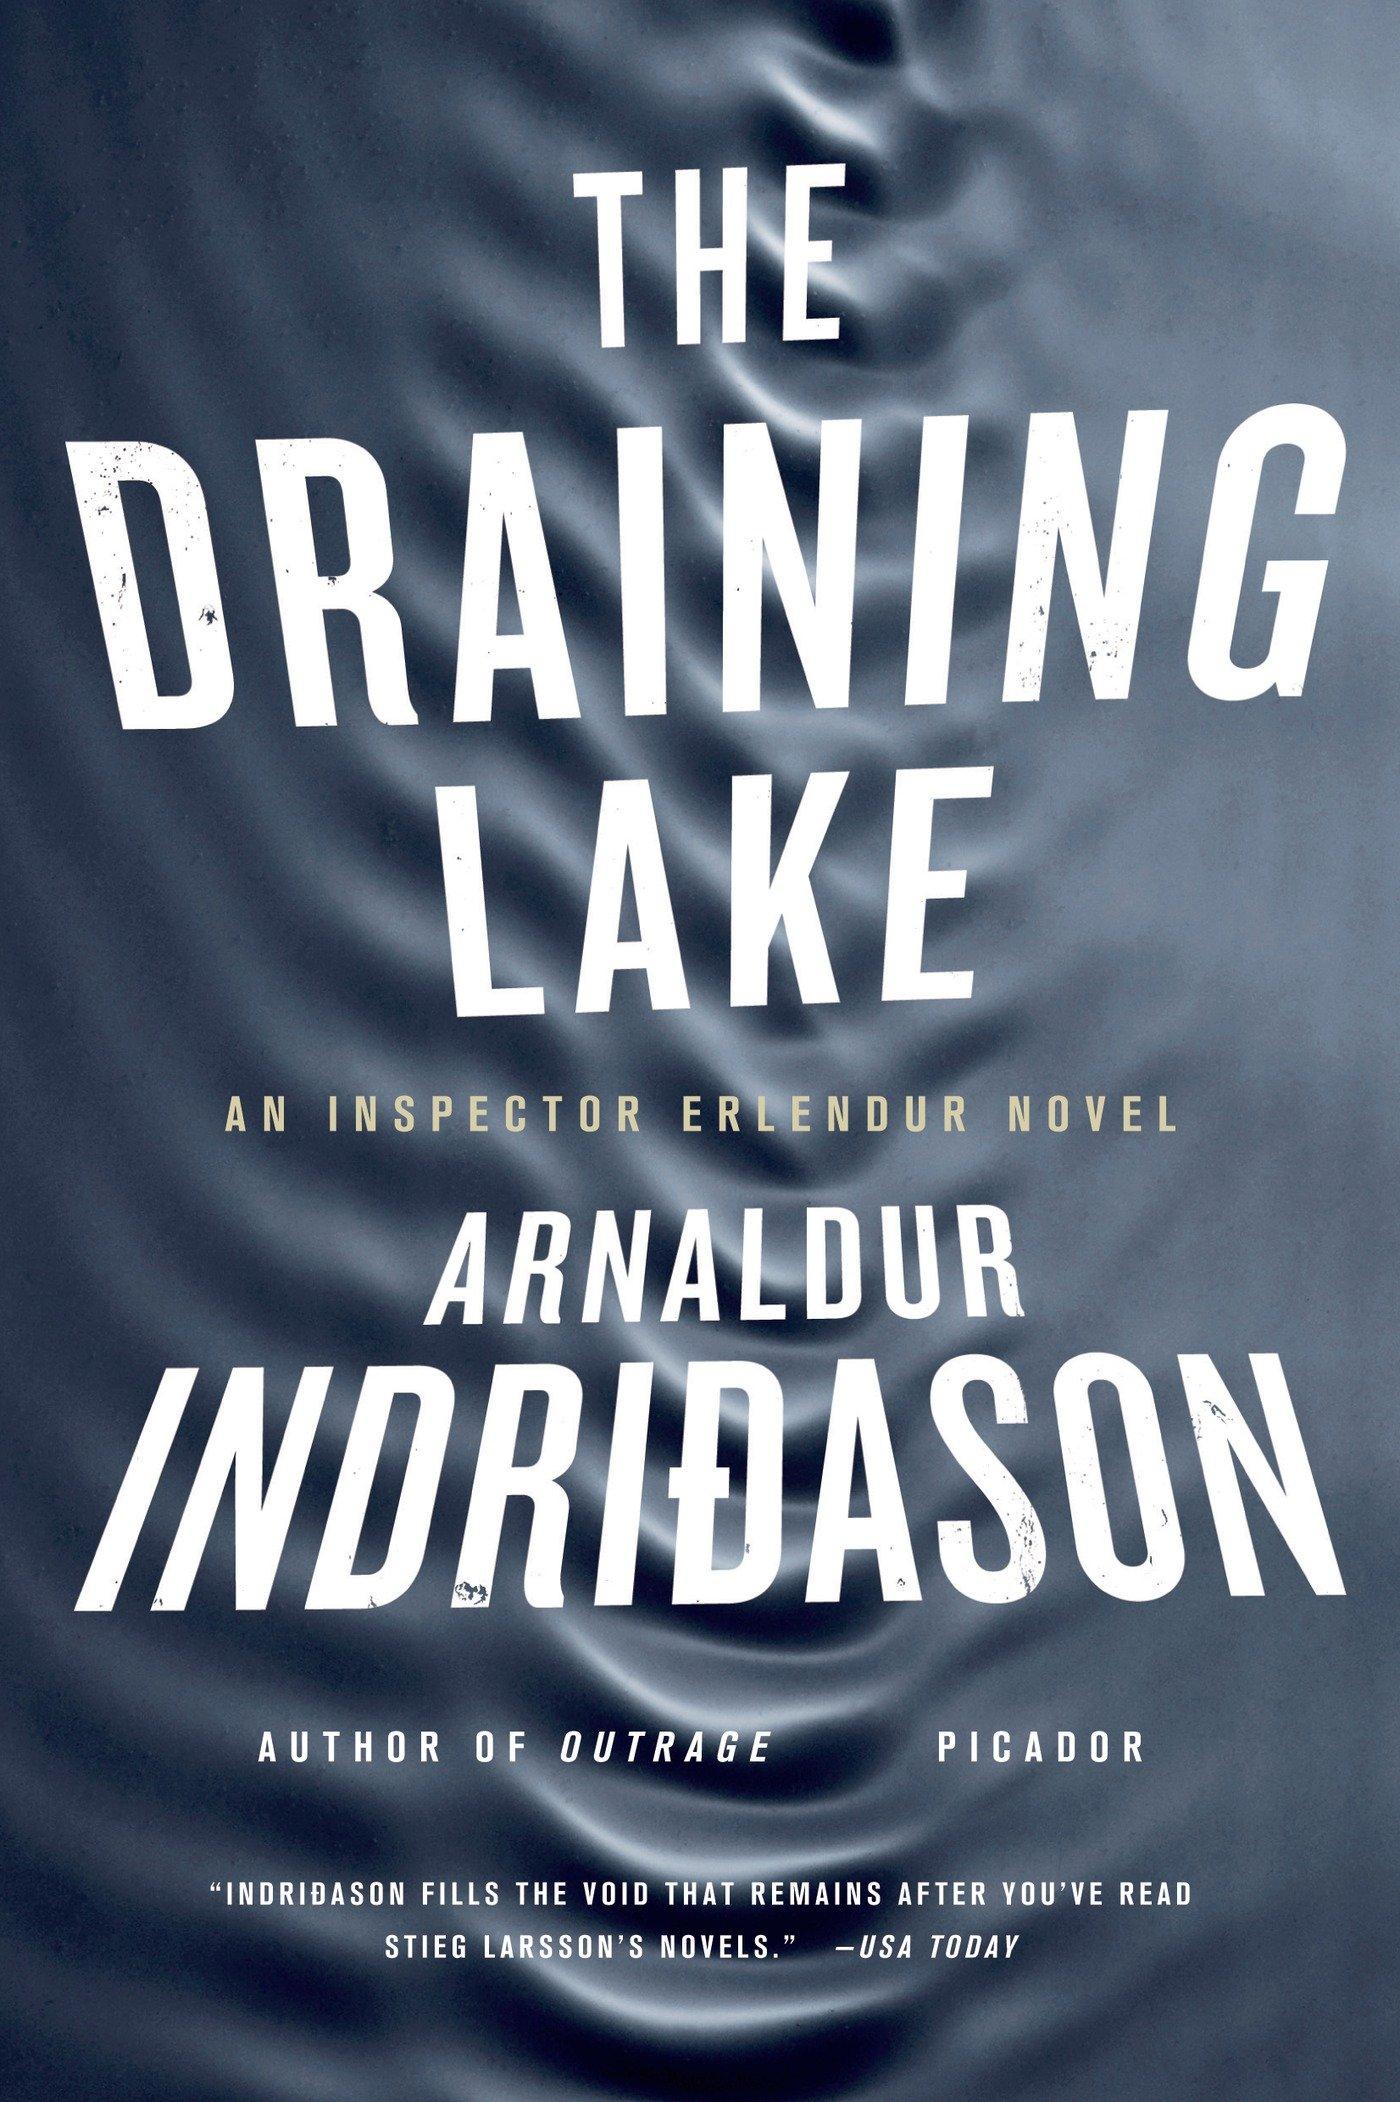 Amazon: The Draining Lake: An Inspector Erlendur Novel (an Inspector  Erlendur Series) (9780312428587): Arnaldur Indridason: Books